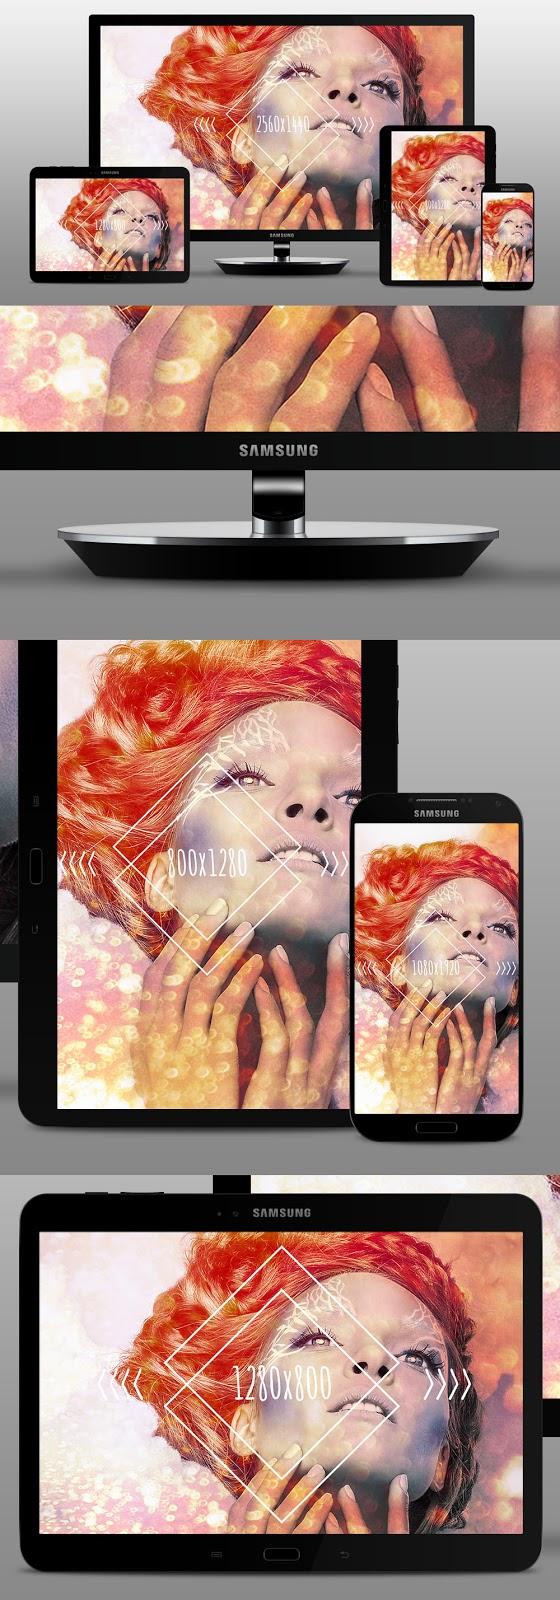 Free Samsung Device Mockup PSD